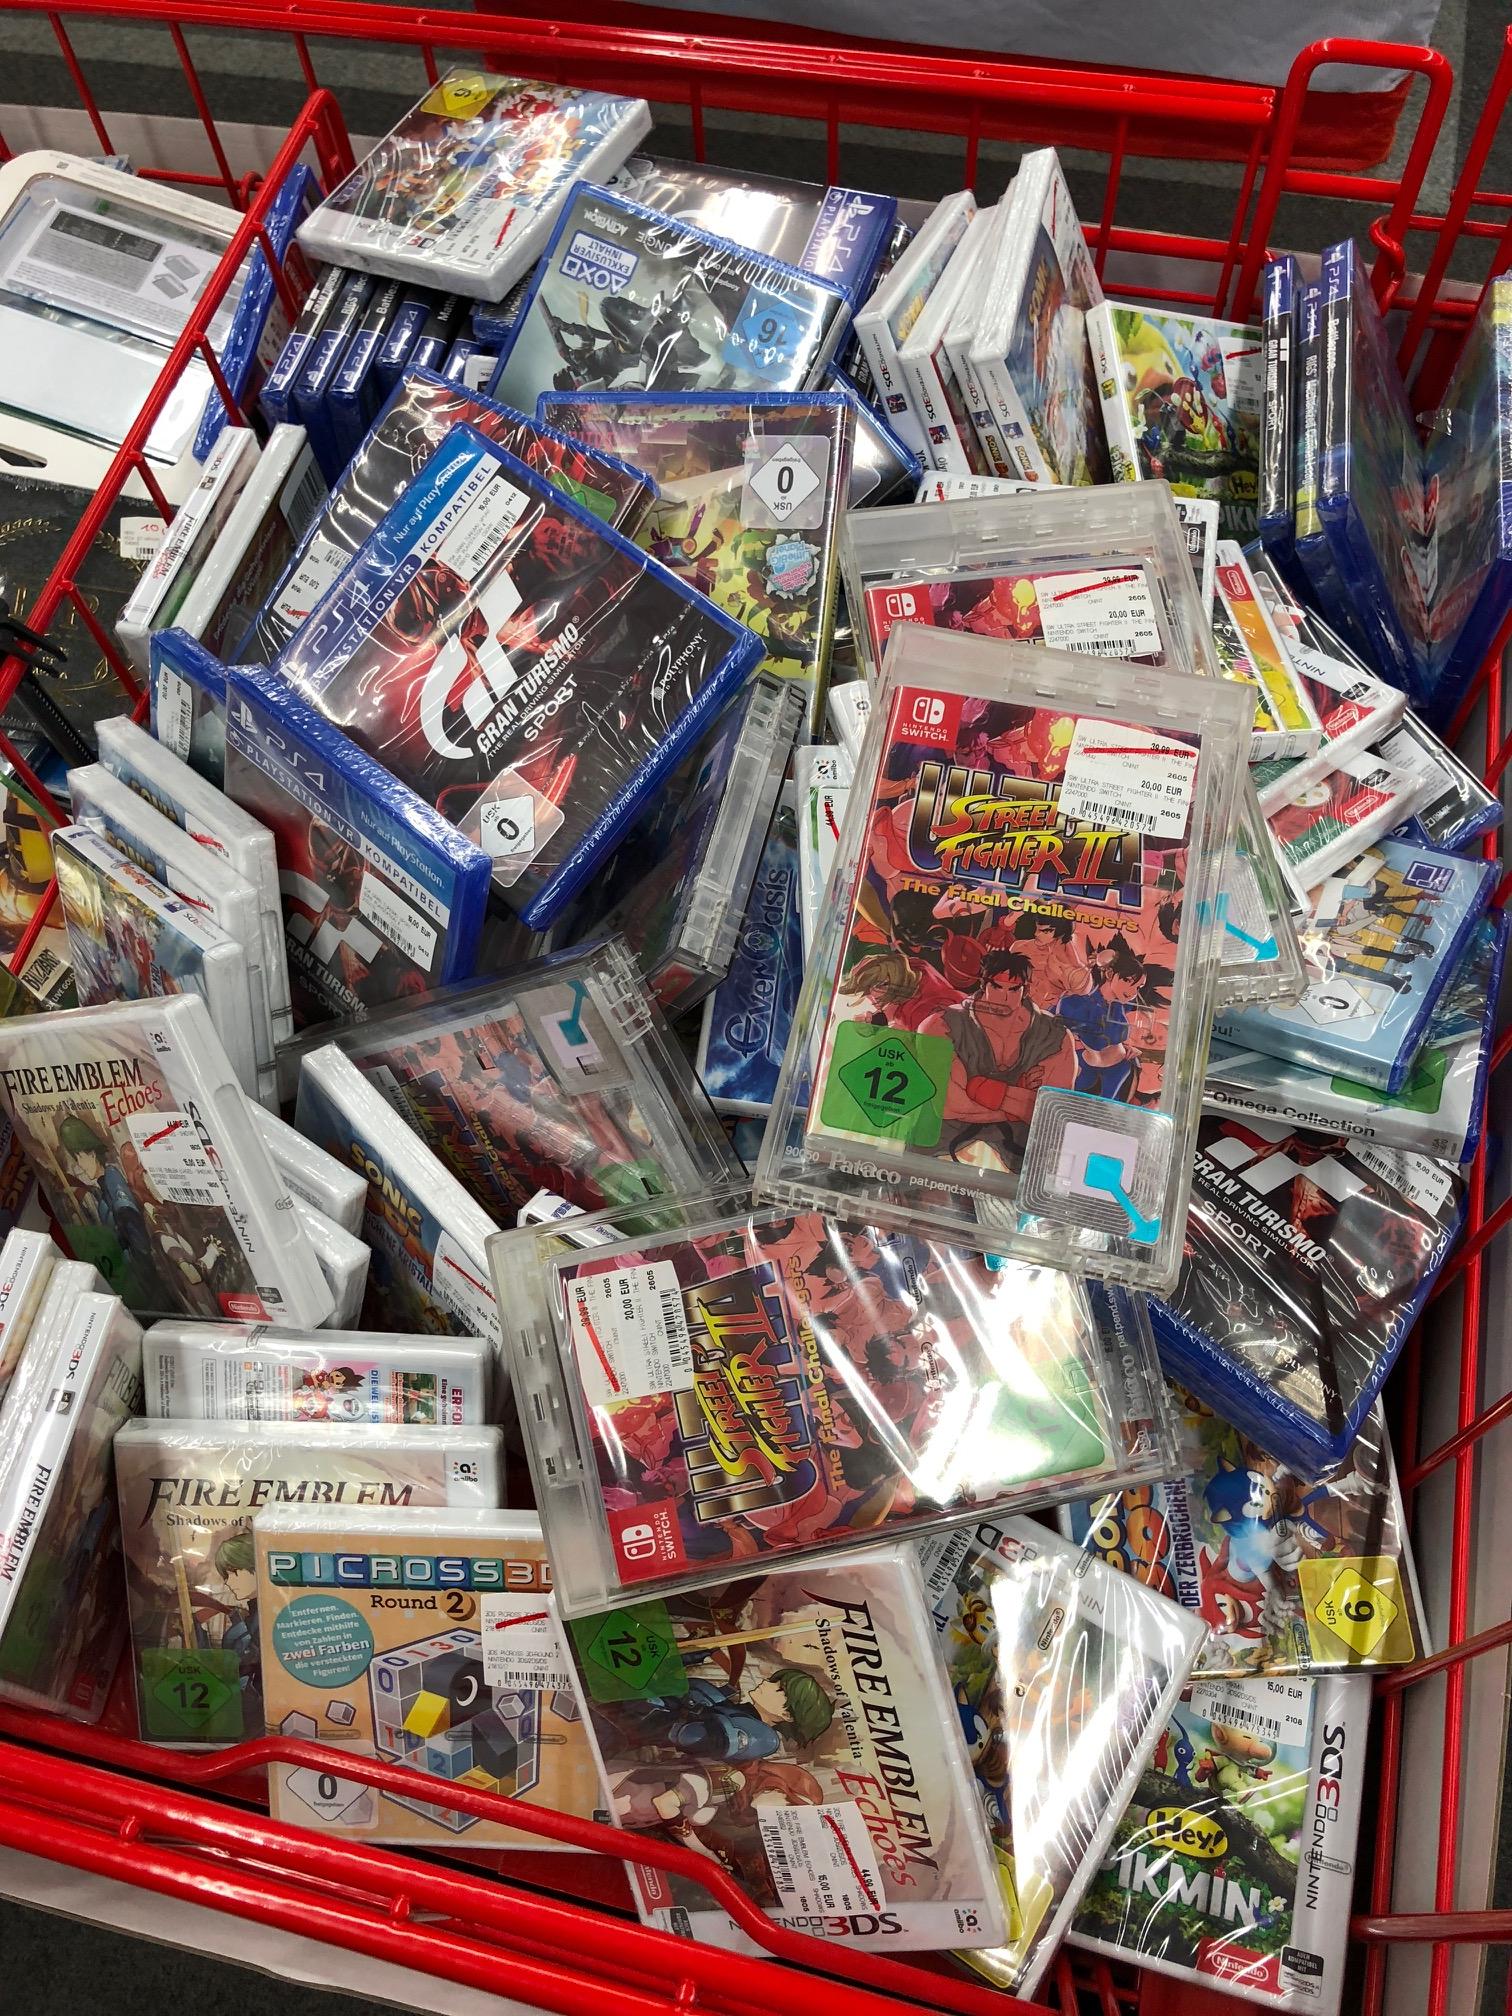 Media Markt Neuss / Videospiele Grabbeltisch Sammeldeal / LOKAL